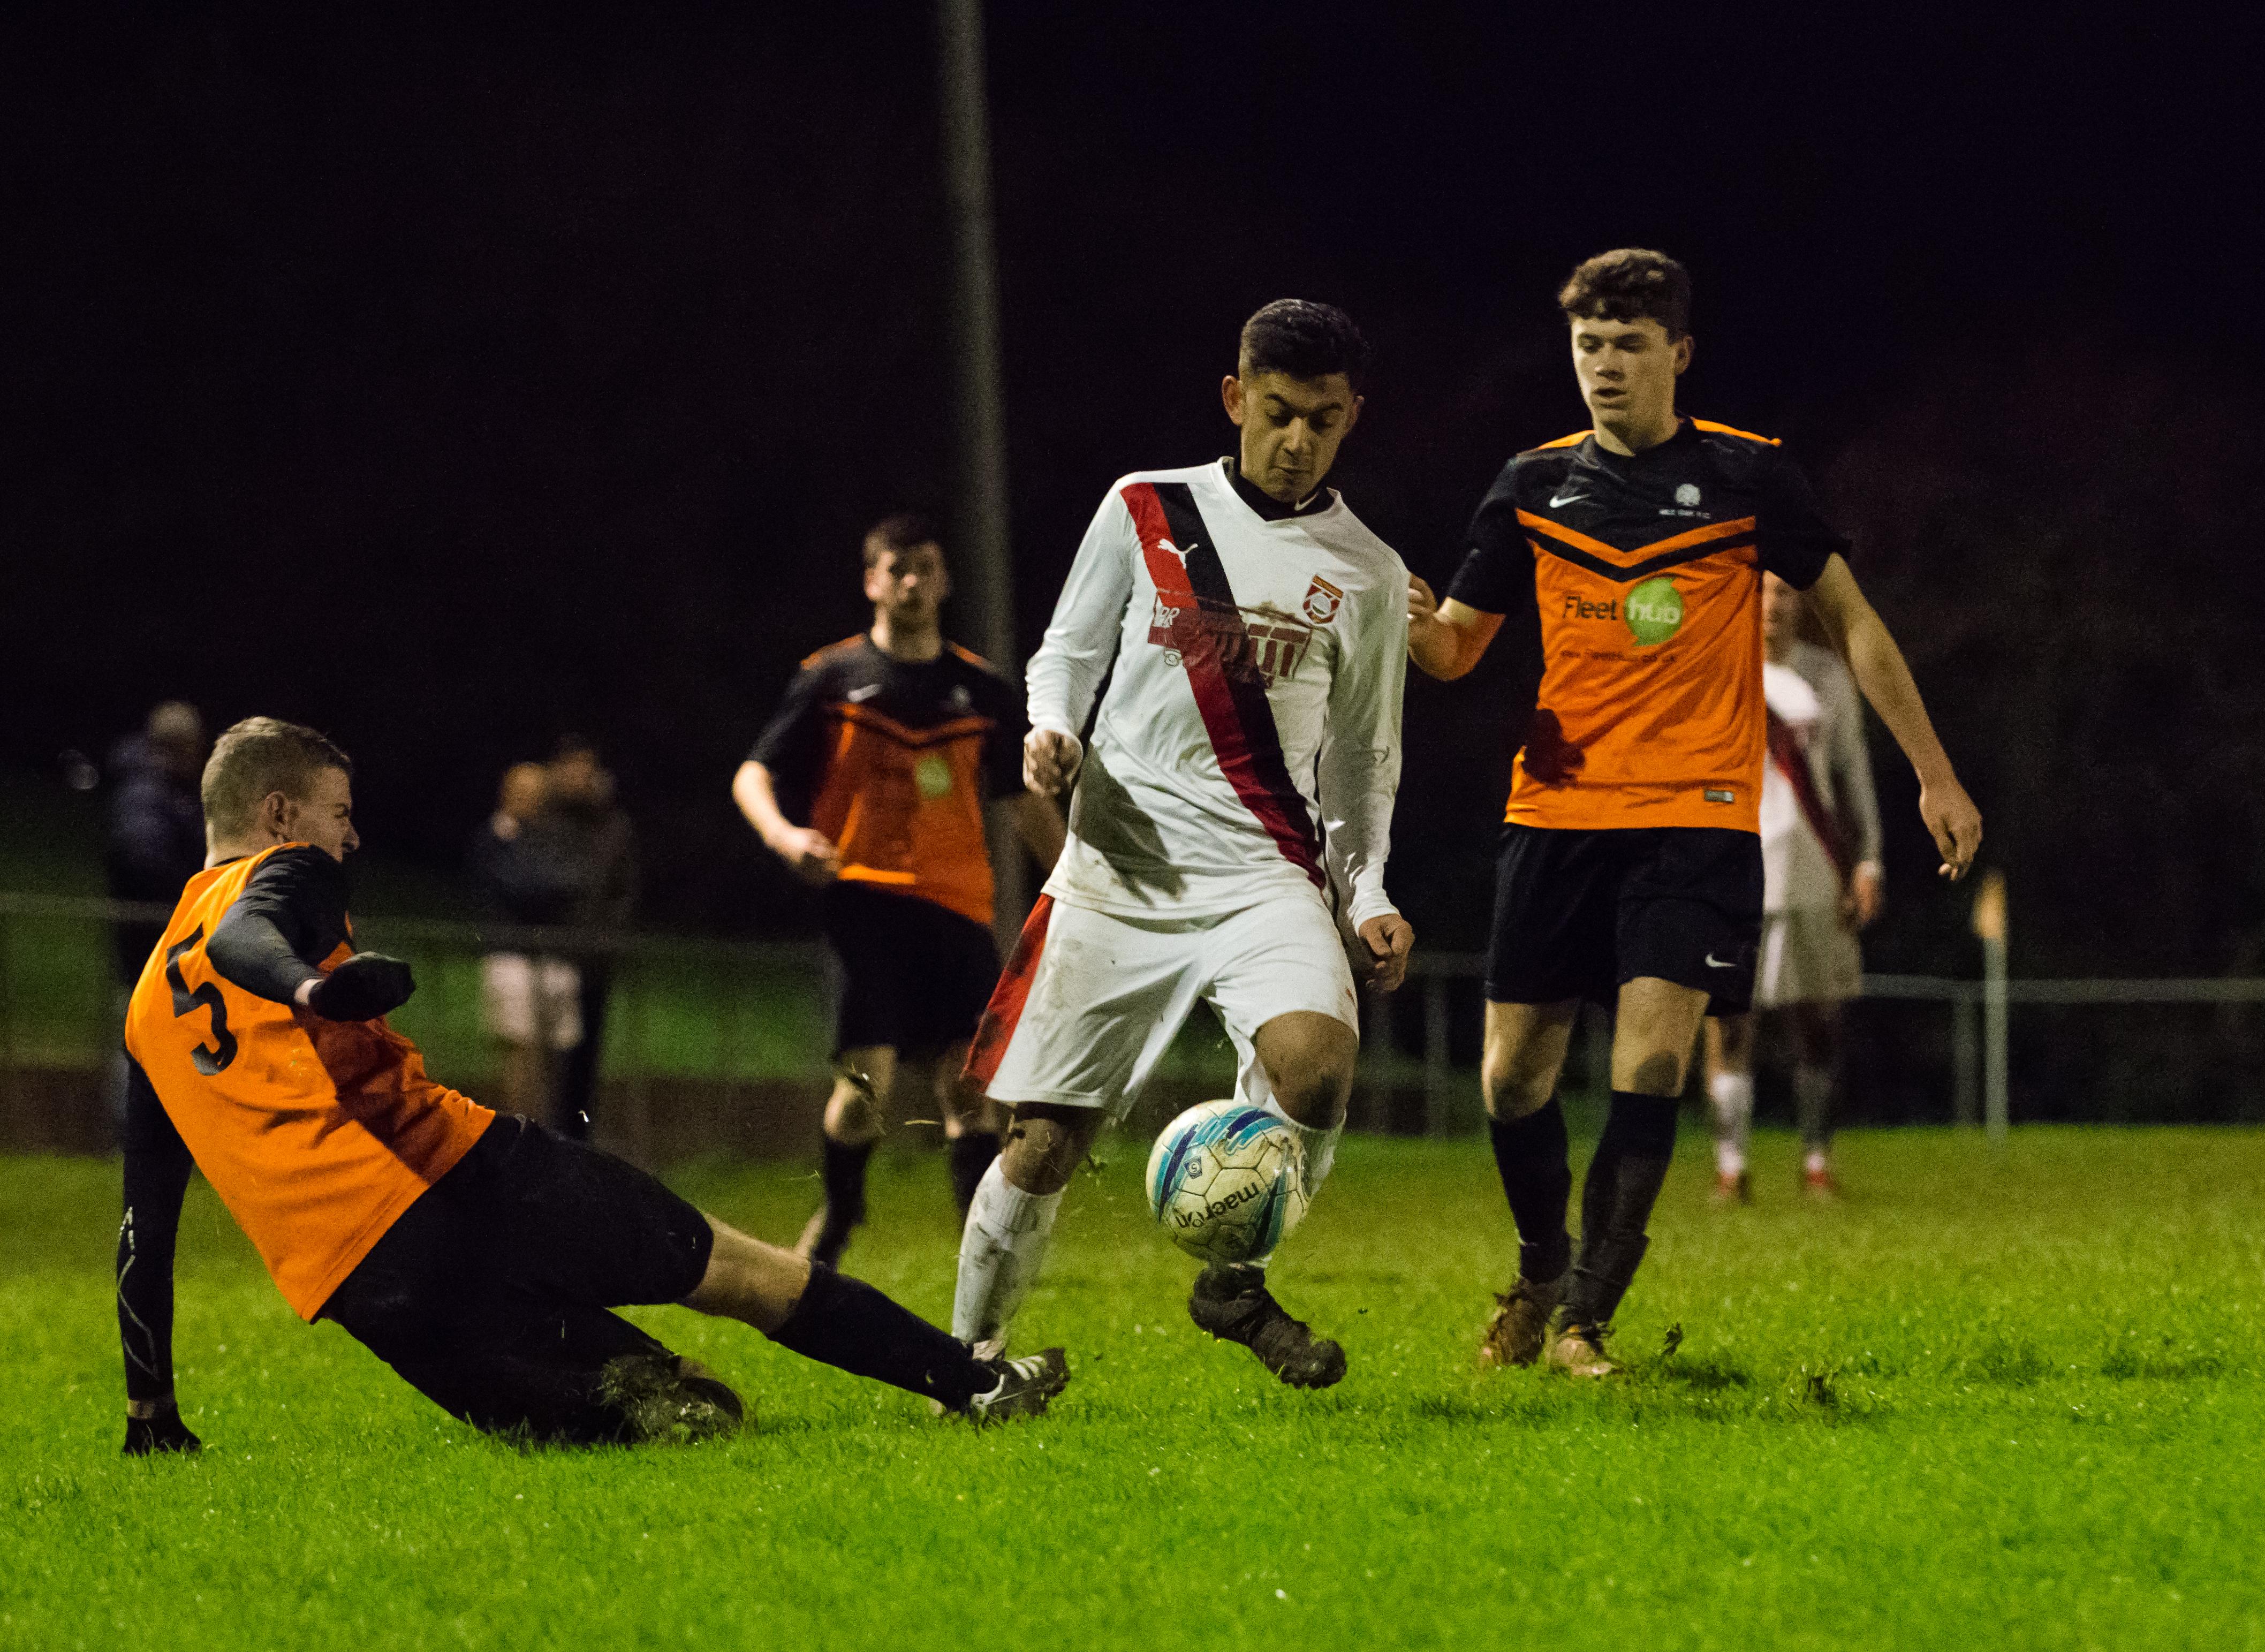 Mile Oak U21s vs Southwick FC U21s 14.12.17 24